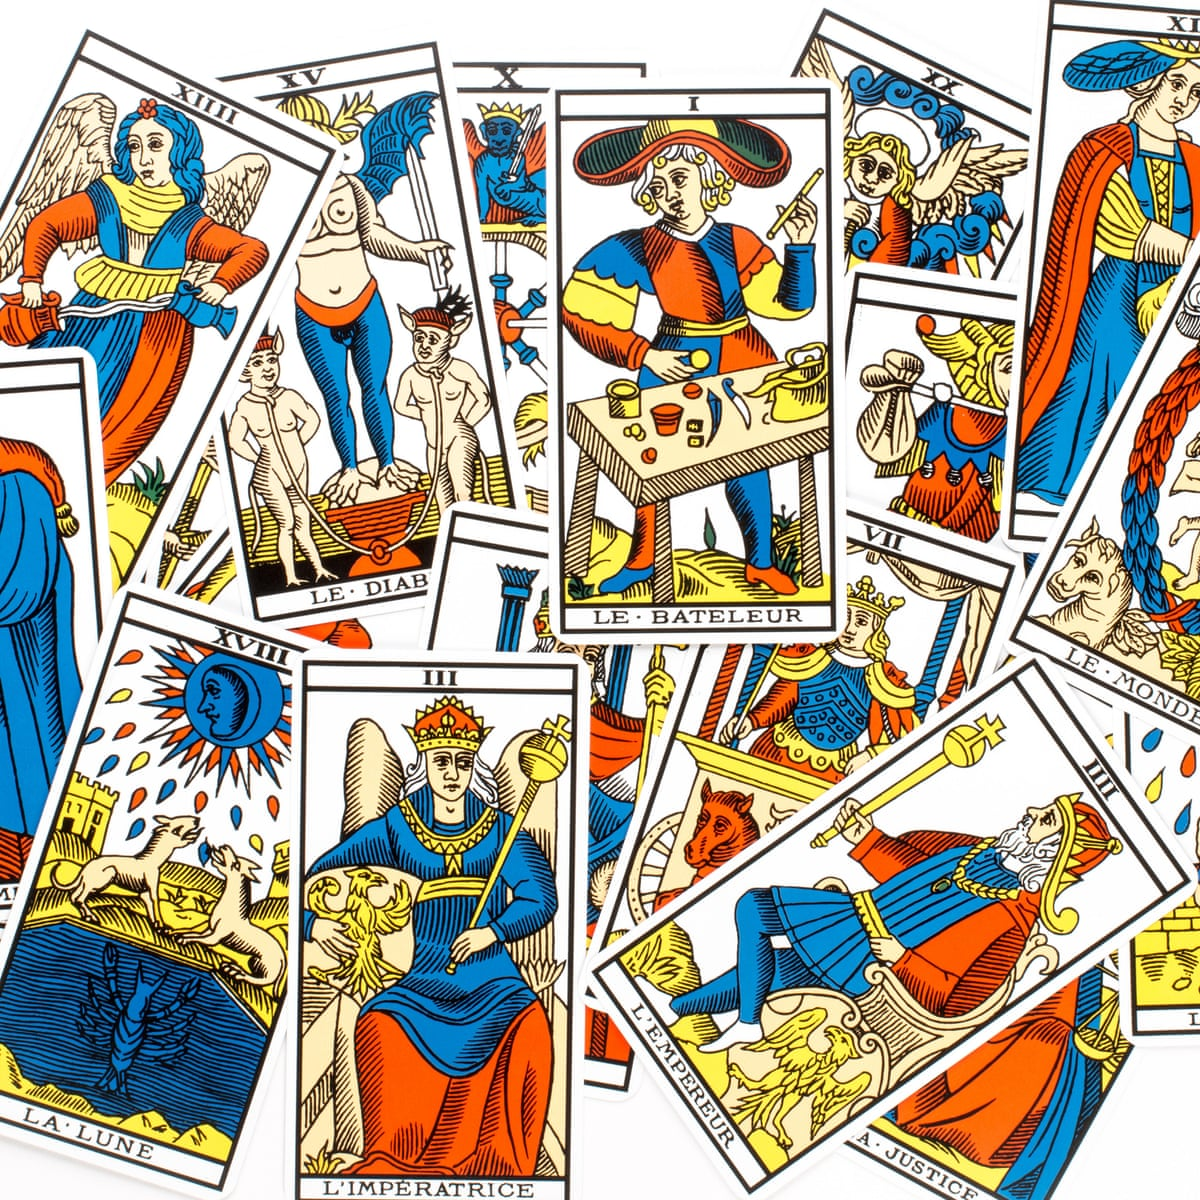 Me tarot will he call Psychic Readings